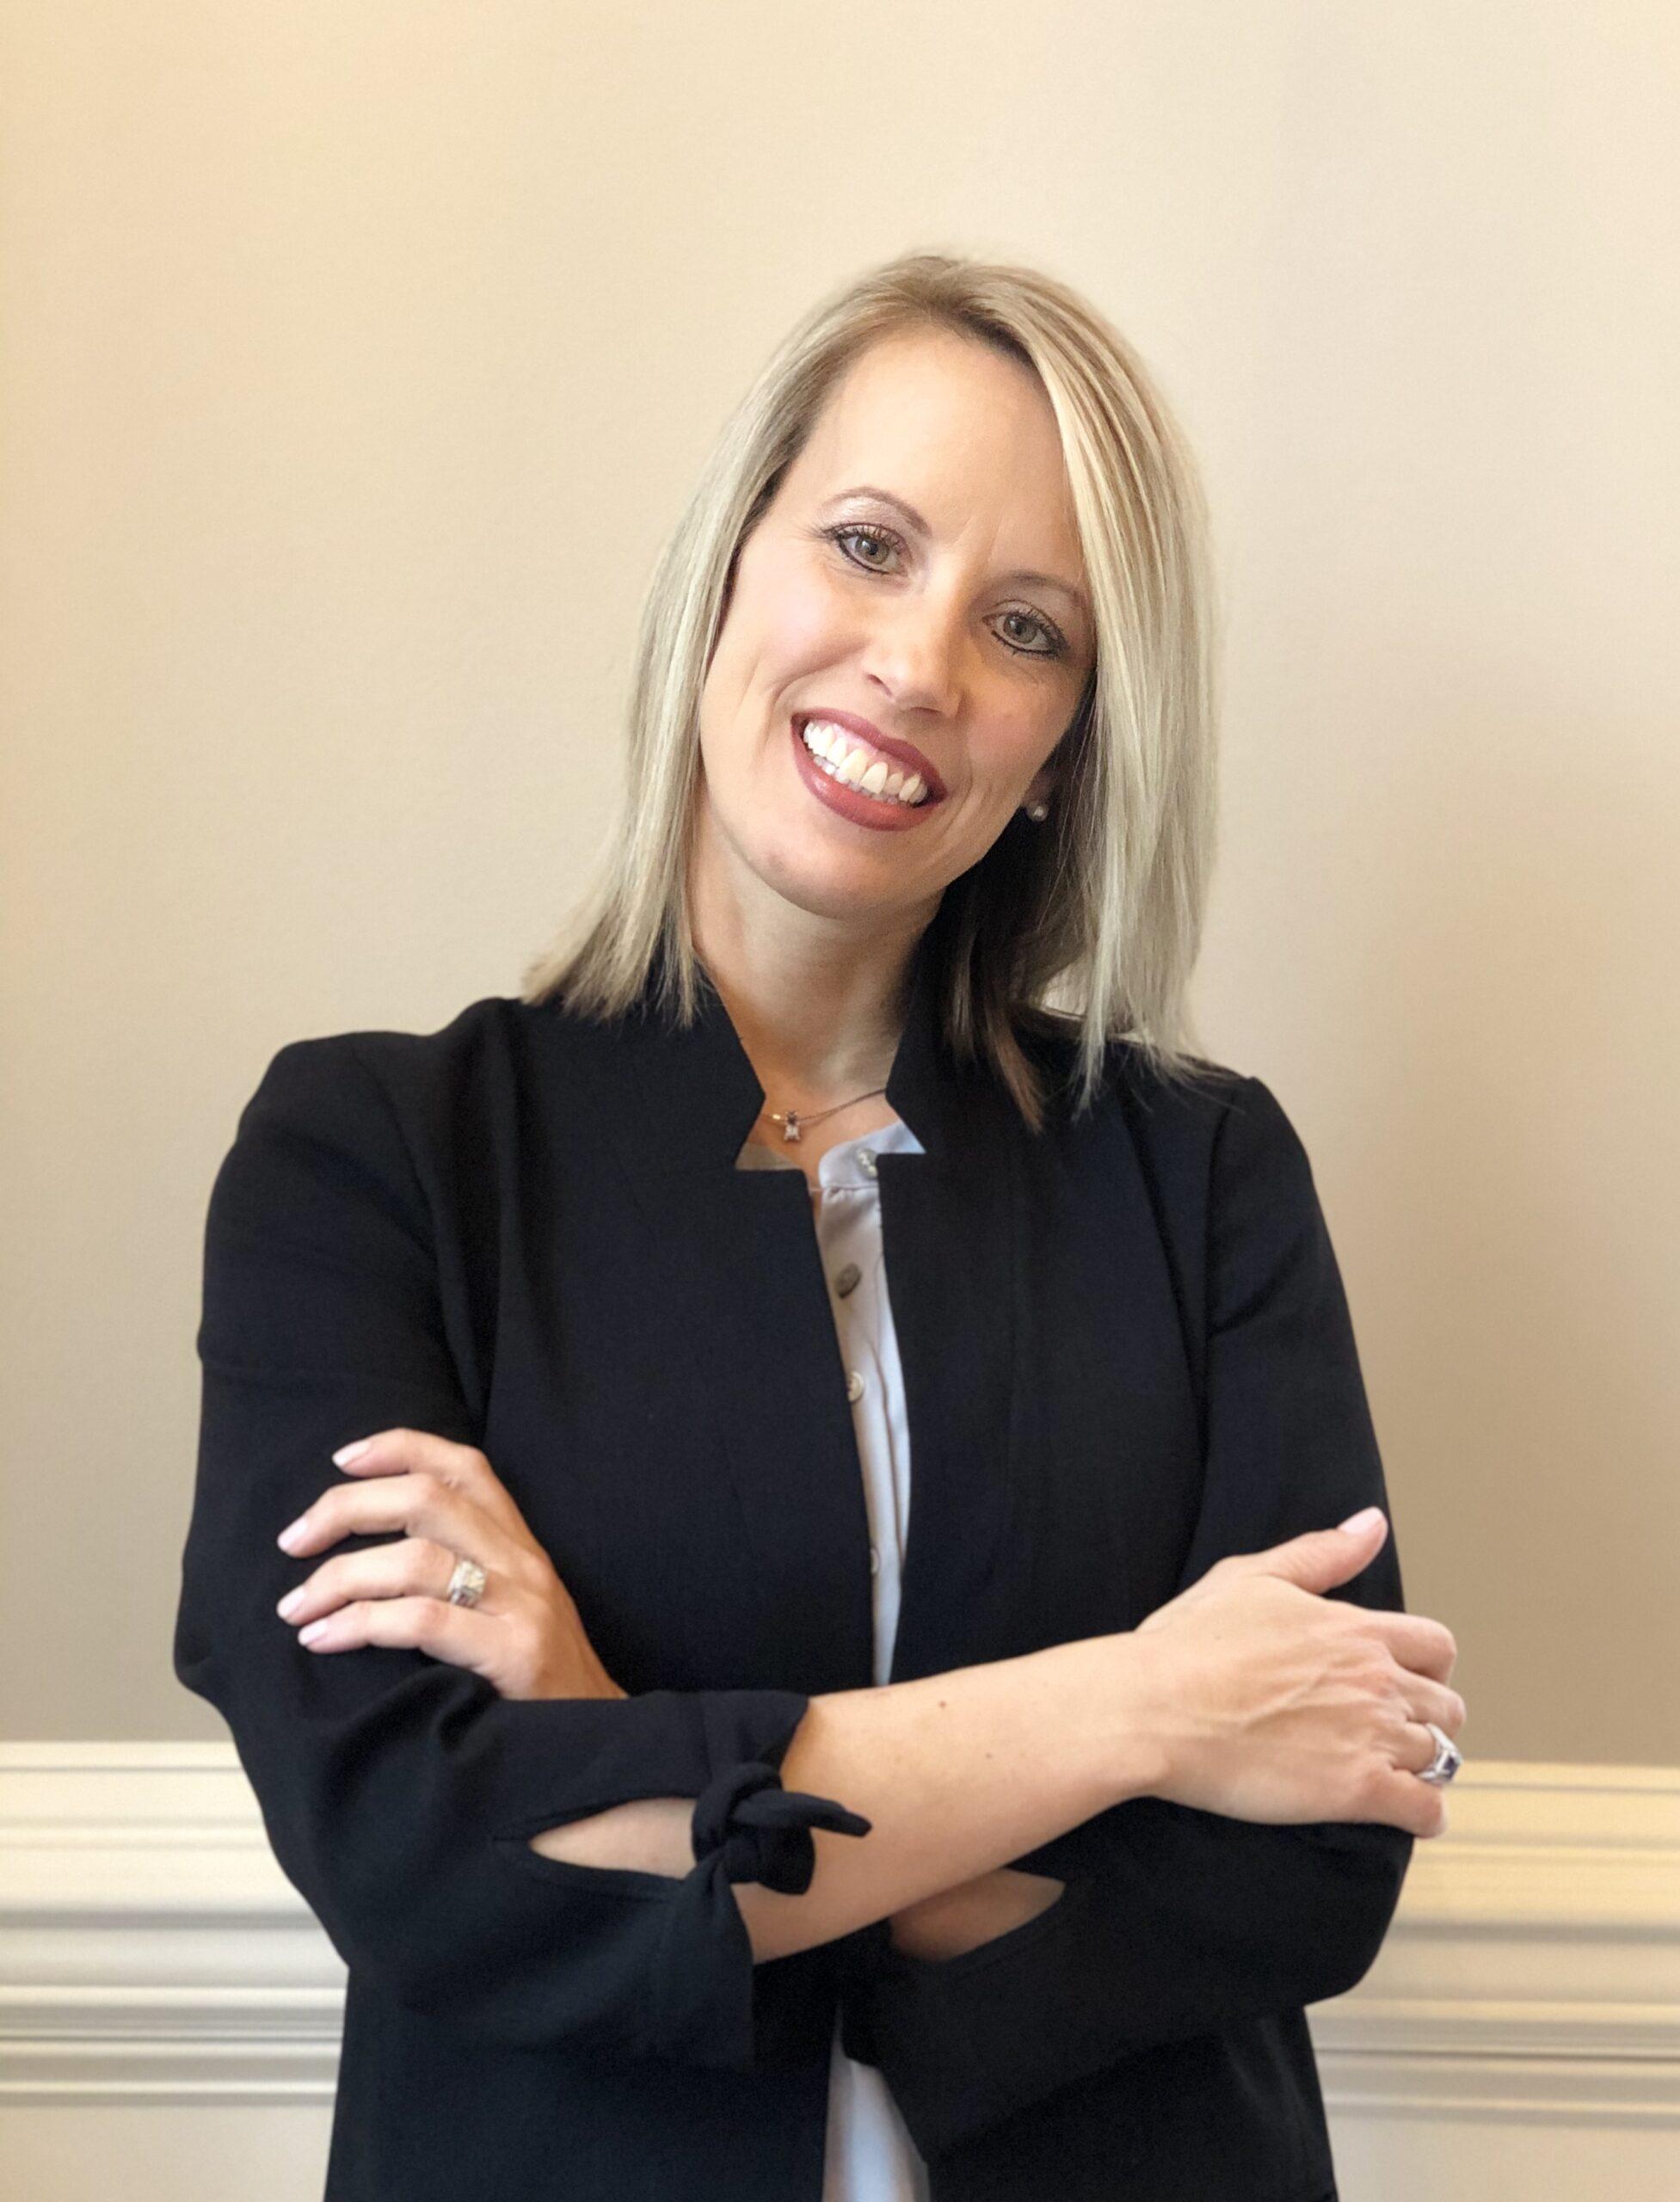 Kristine Bennett